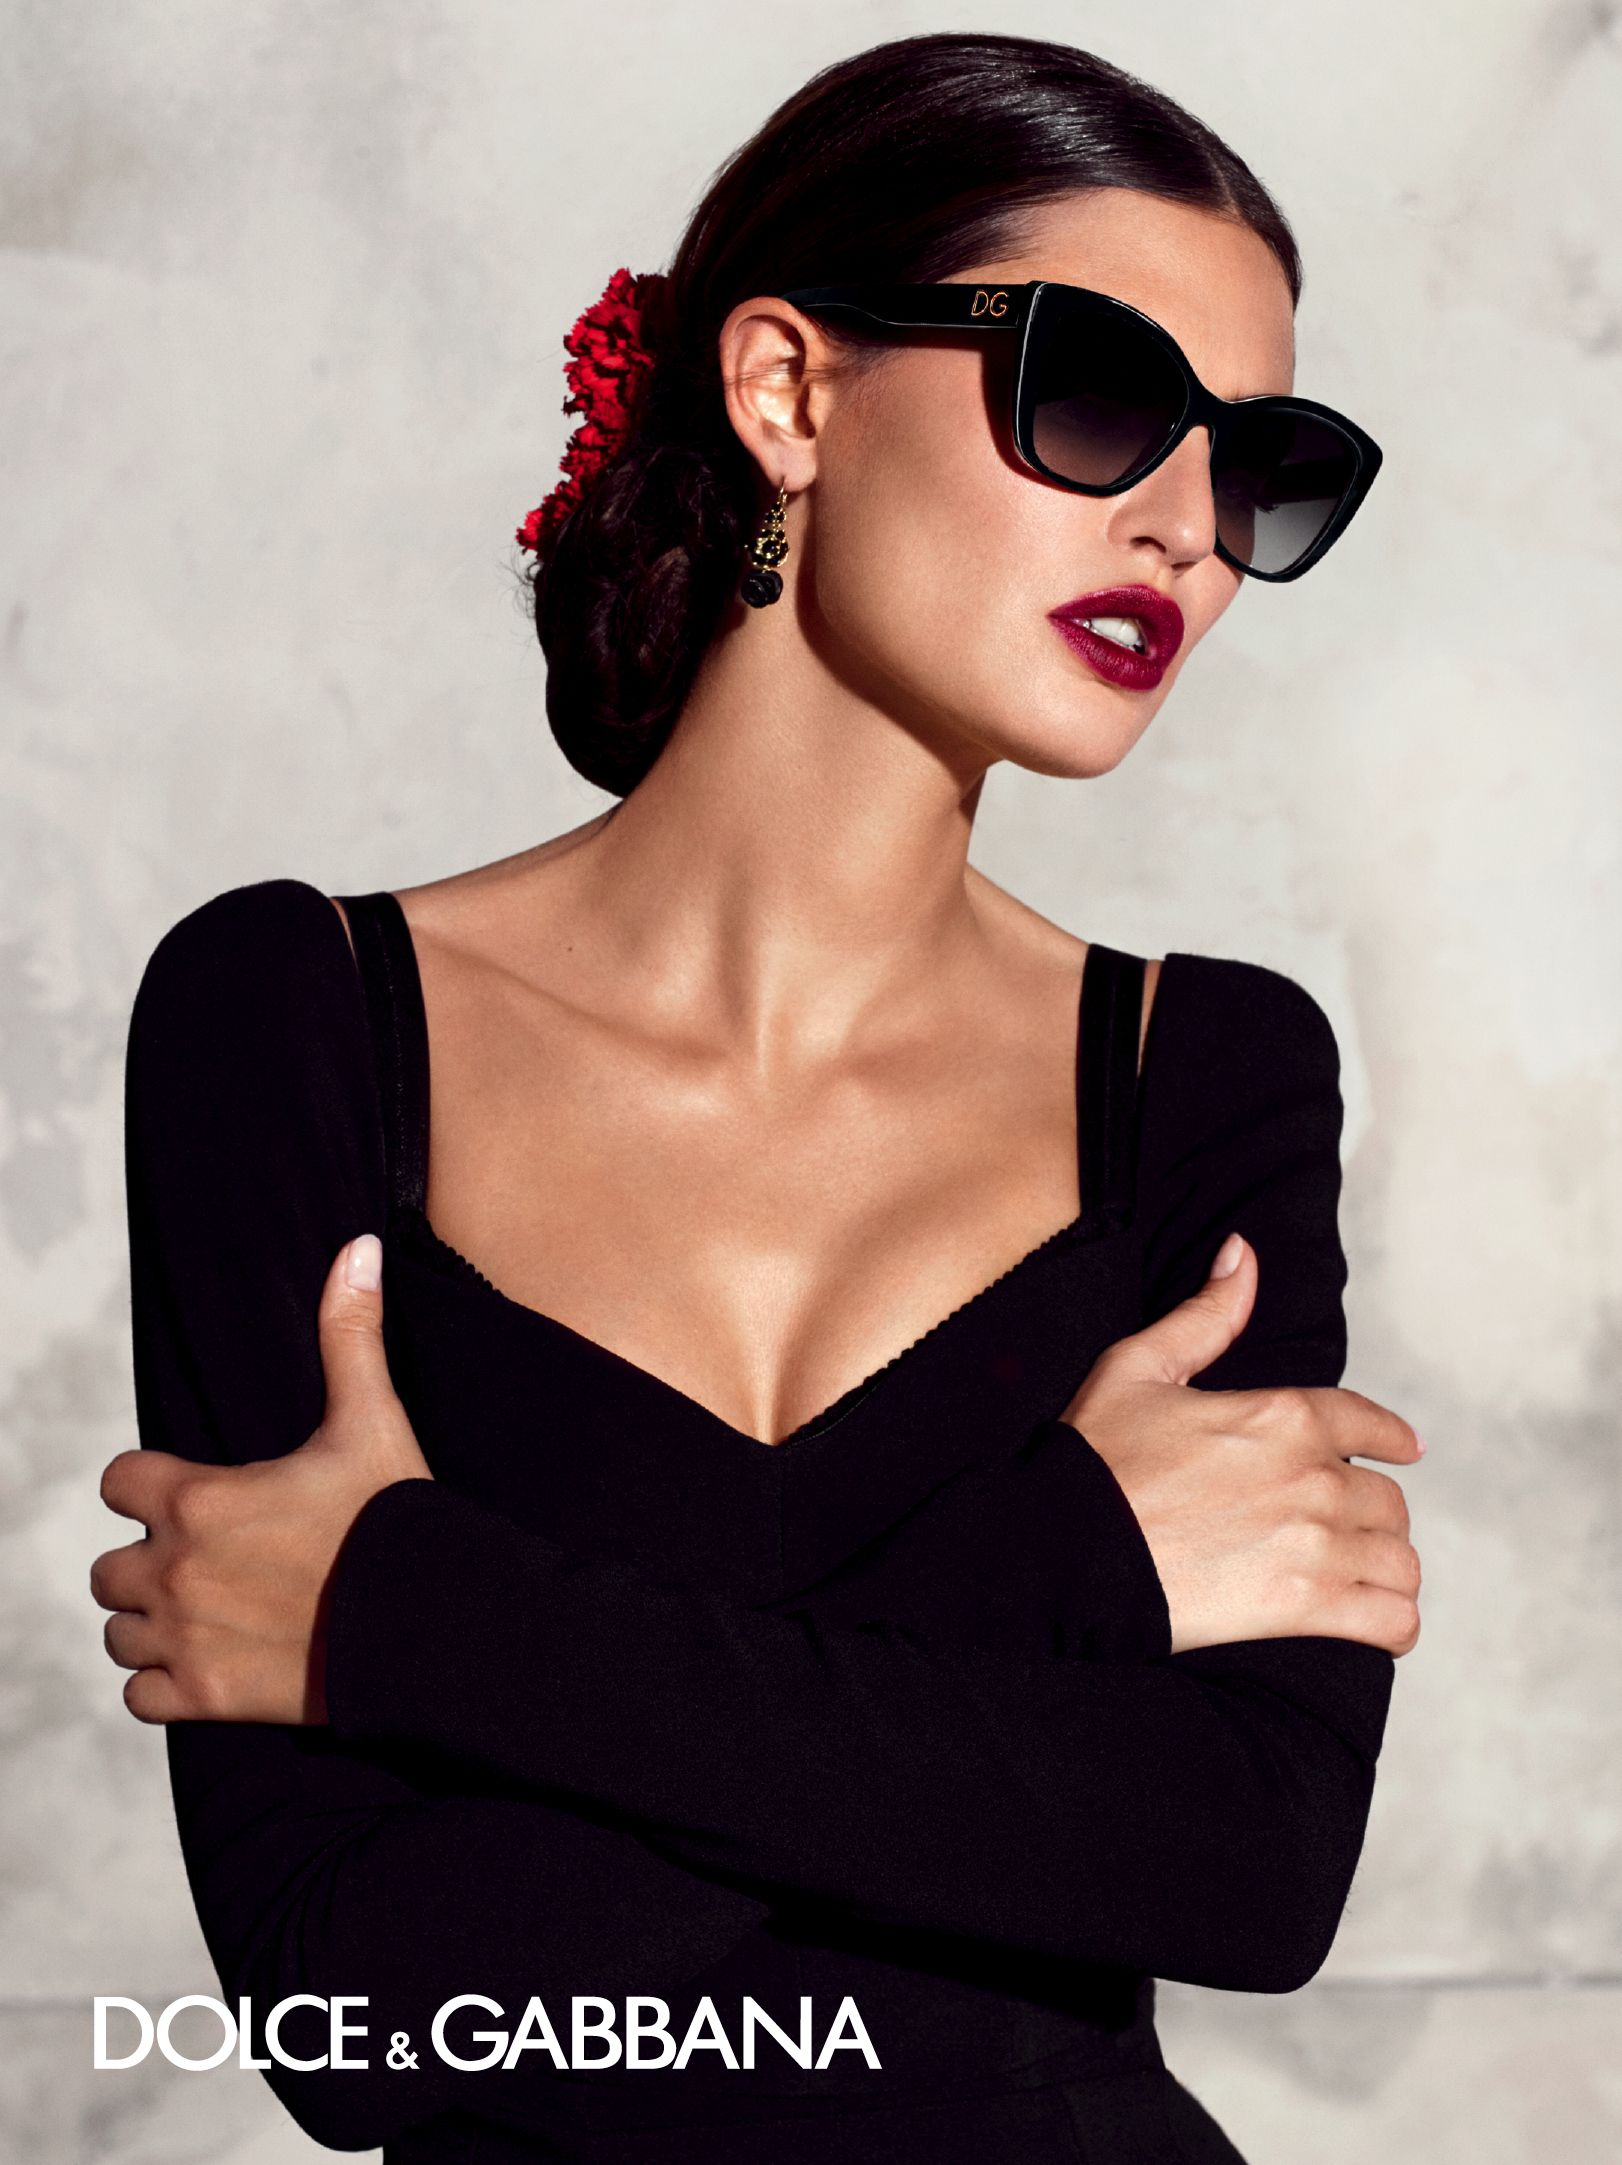 19bab60fa8a8 Dolce Gabbana Summer 2015 Eyewear Advertising Campaign…